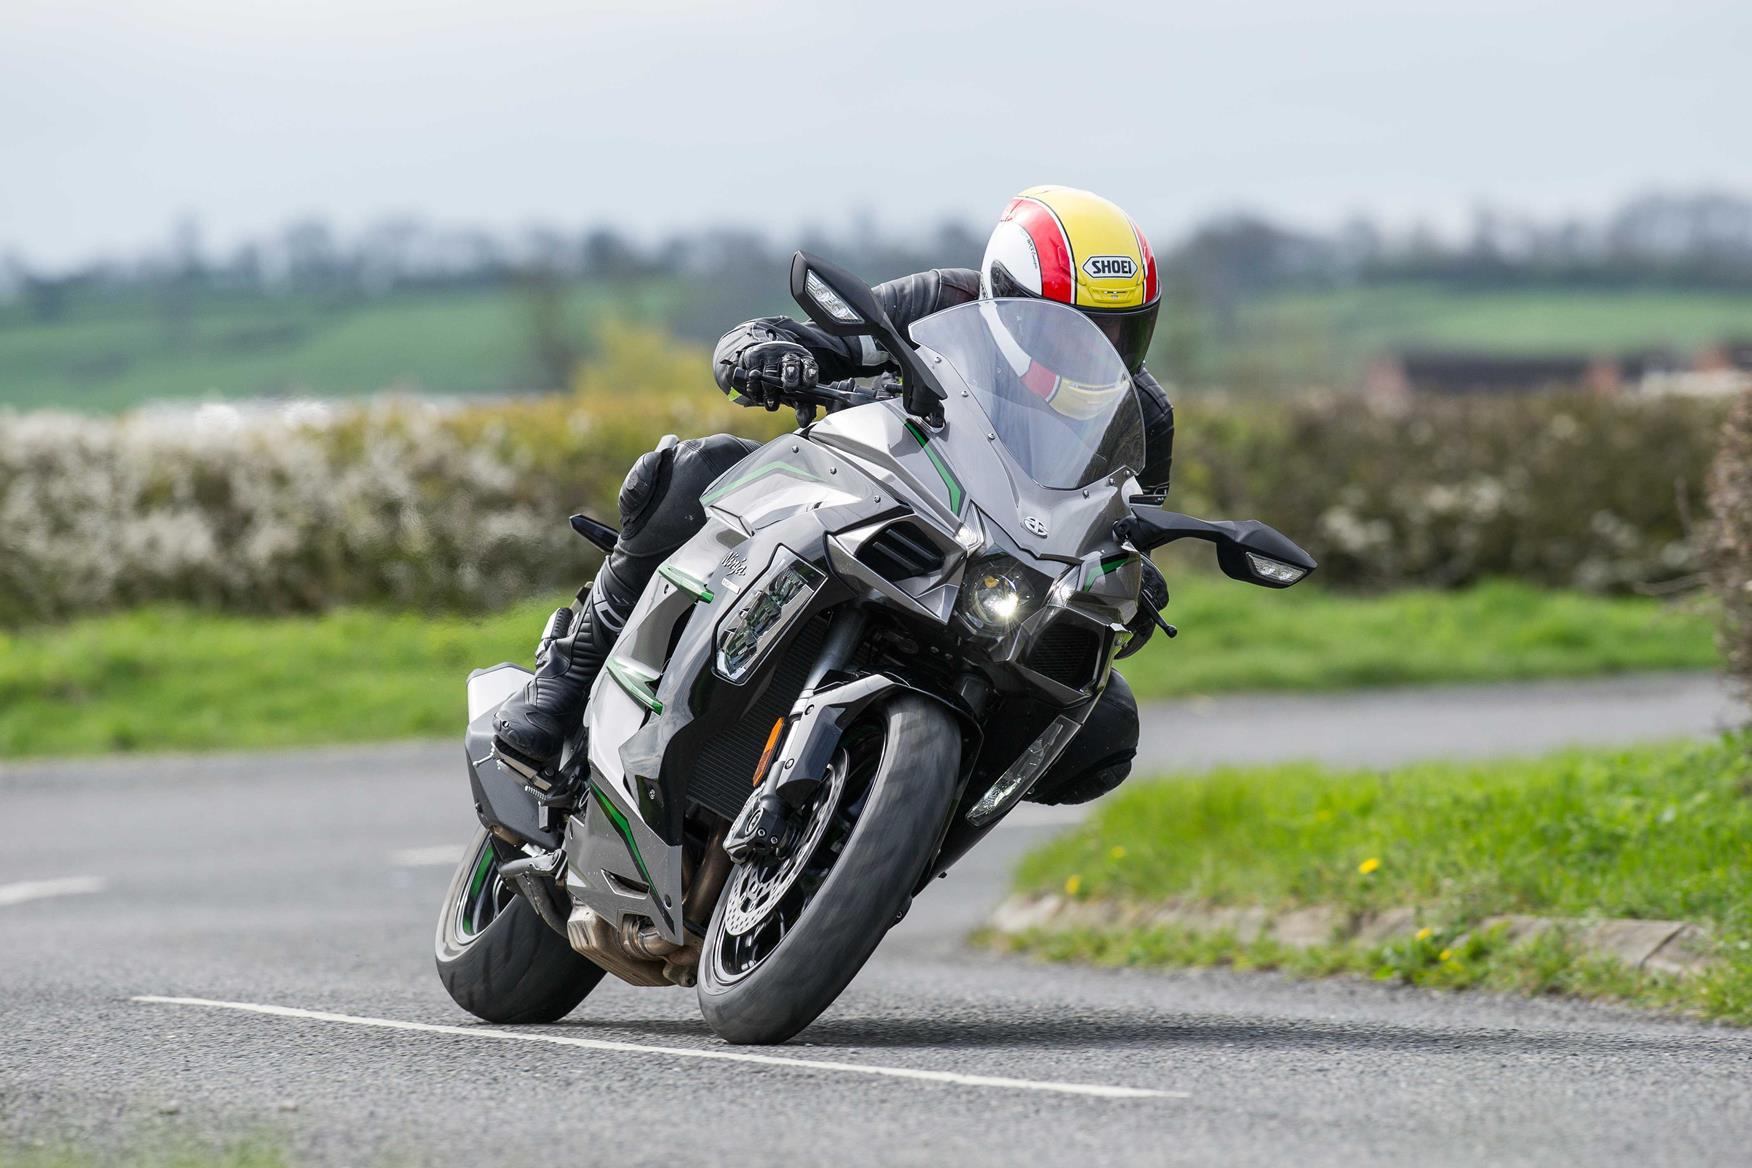 Kawasaki Ninja H2 Sx Se 2019 On Review Specs Prices Mcn